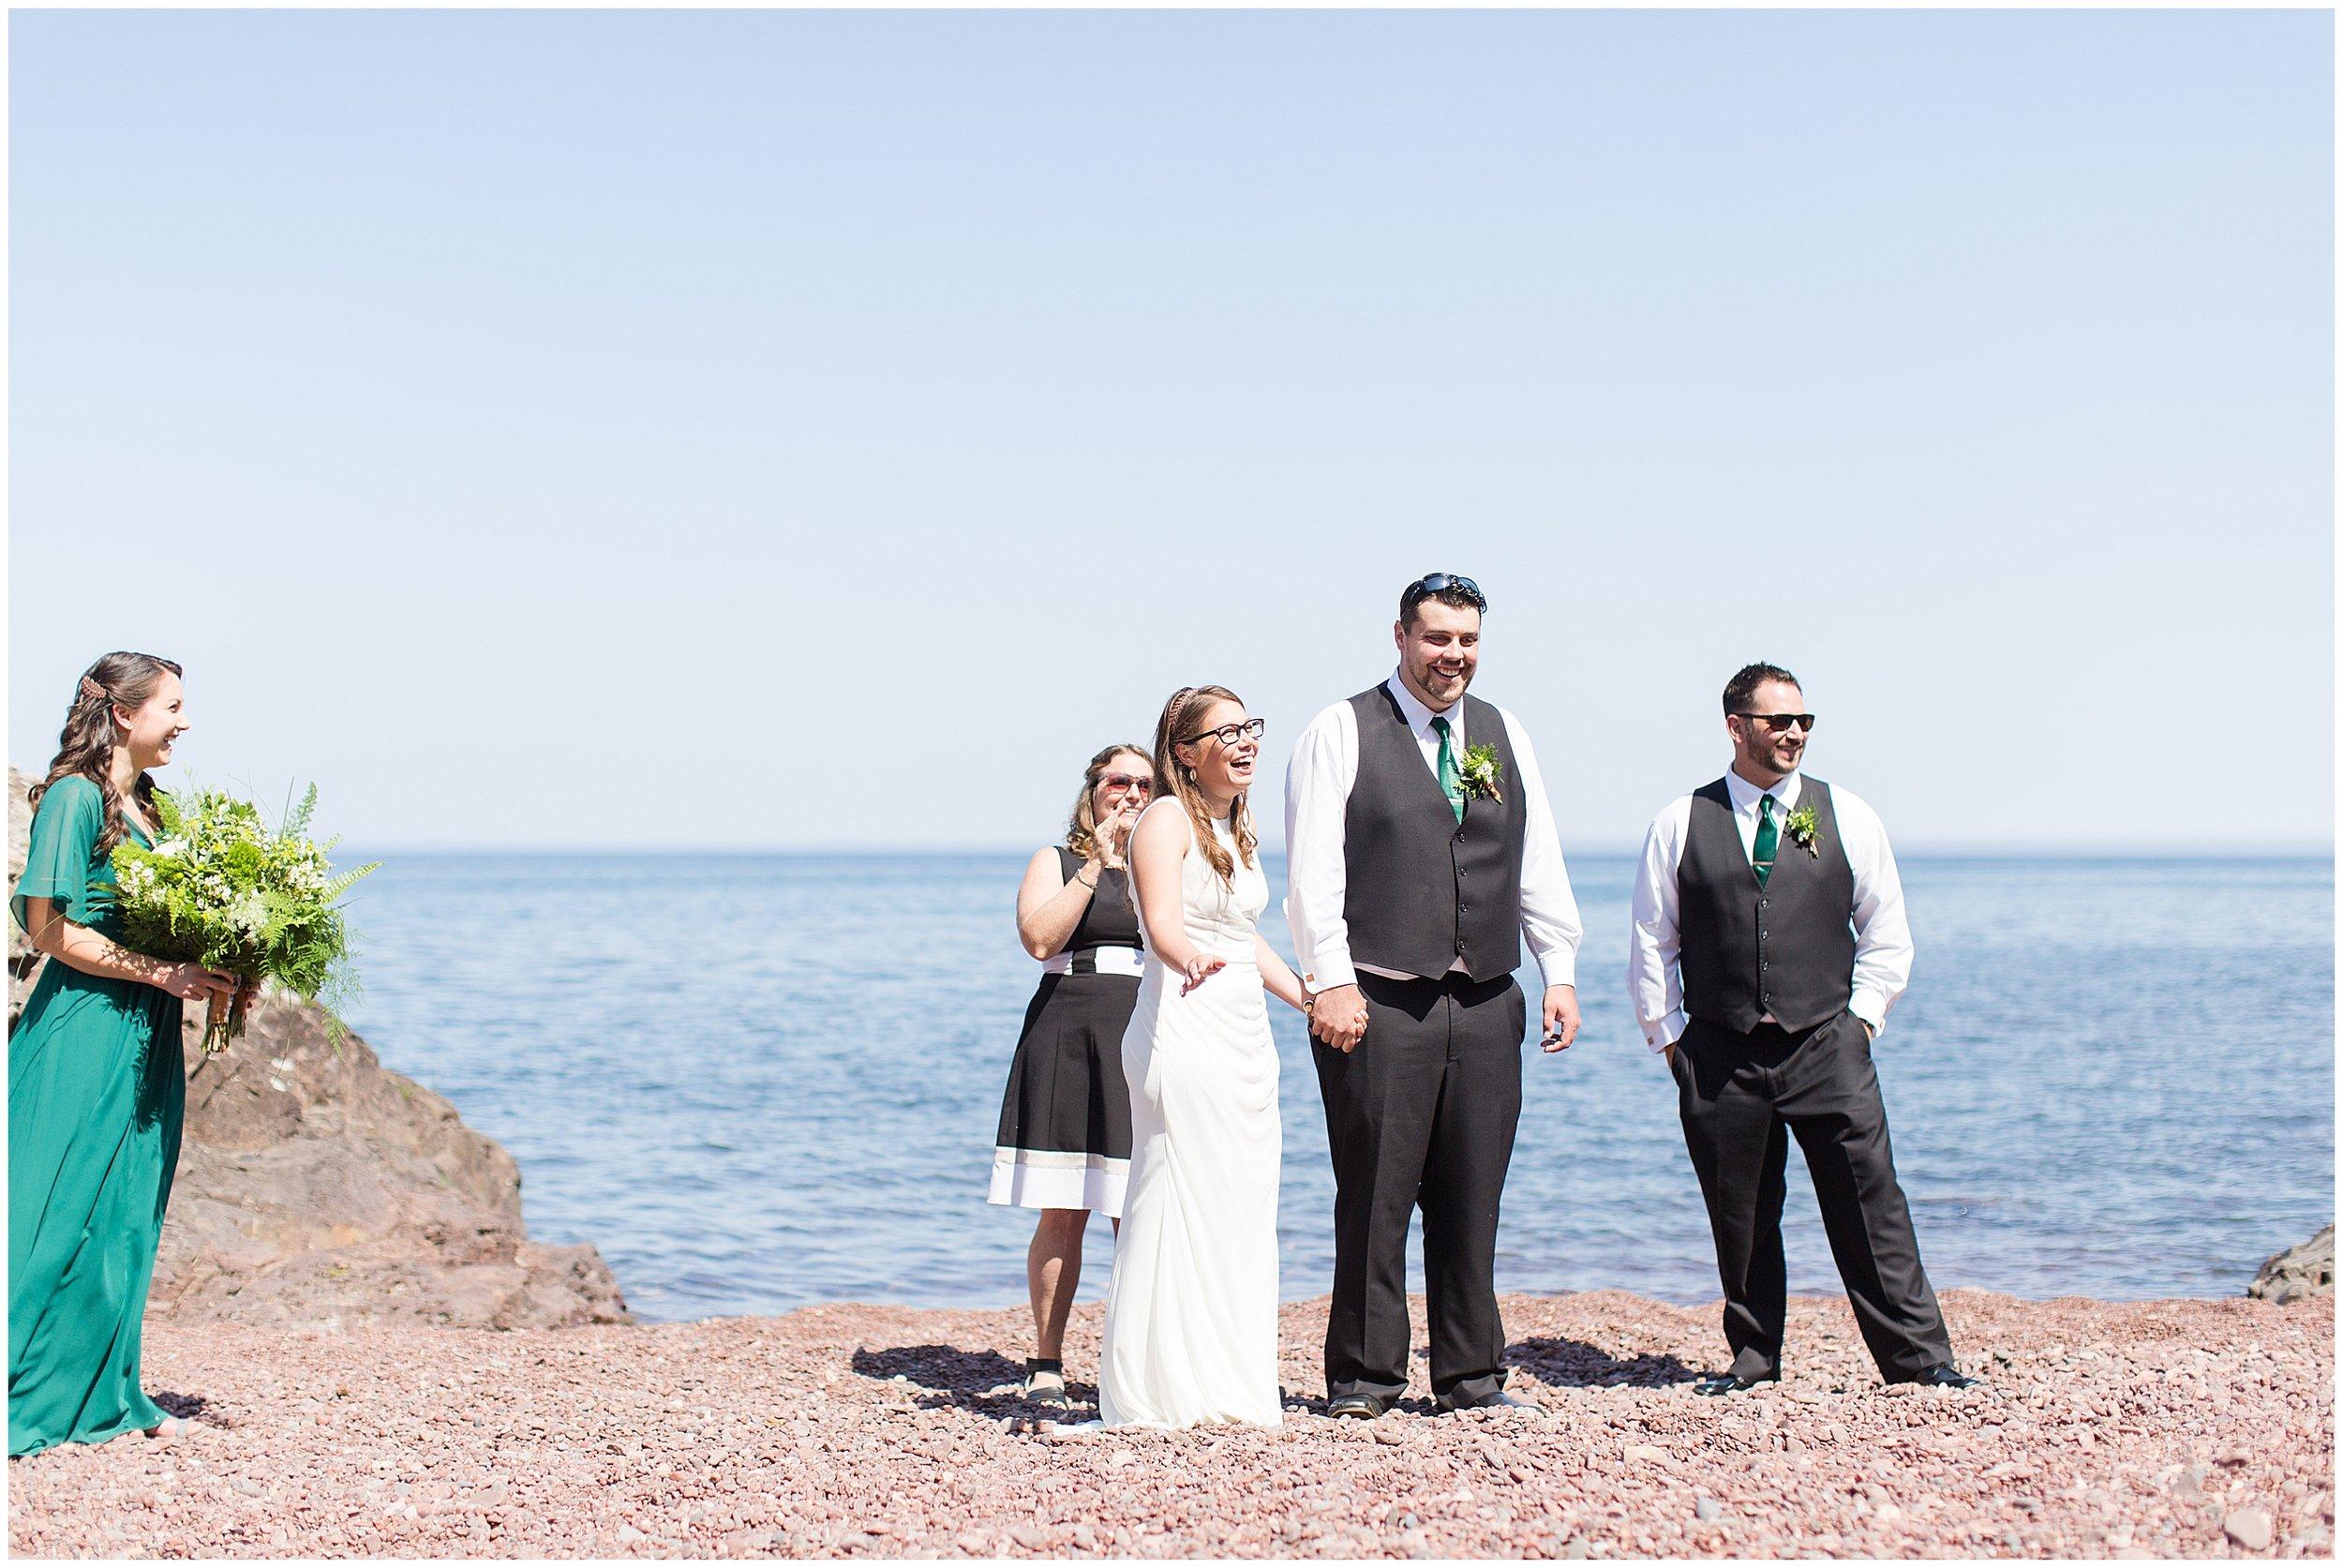 Copper Harbor MI Wedding_0032.jpg